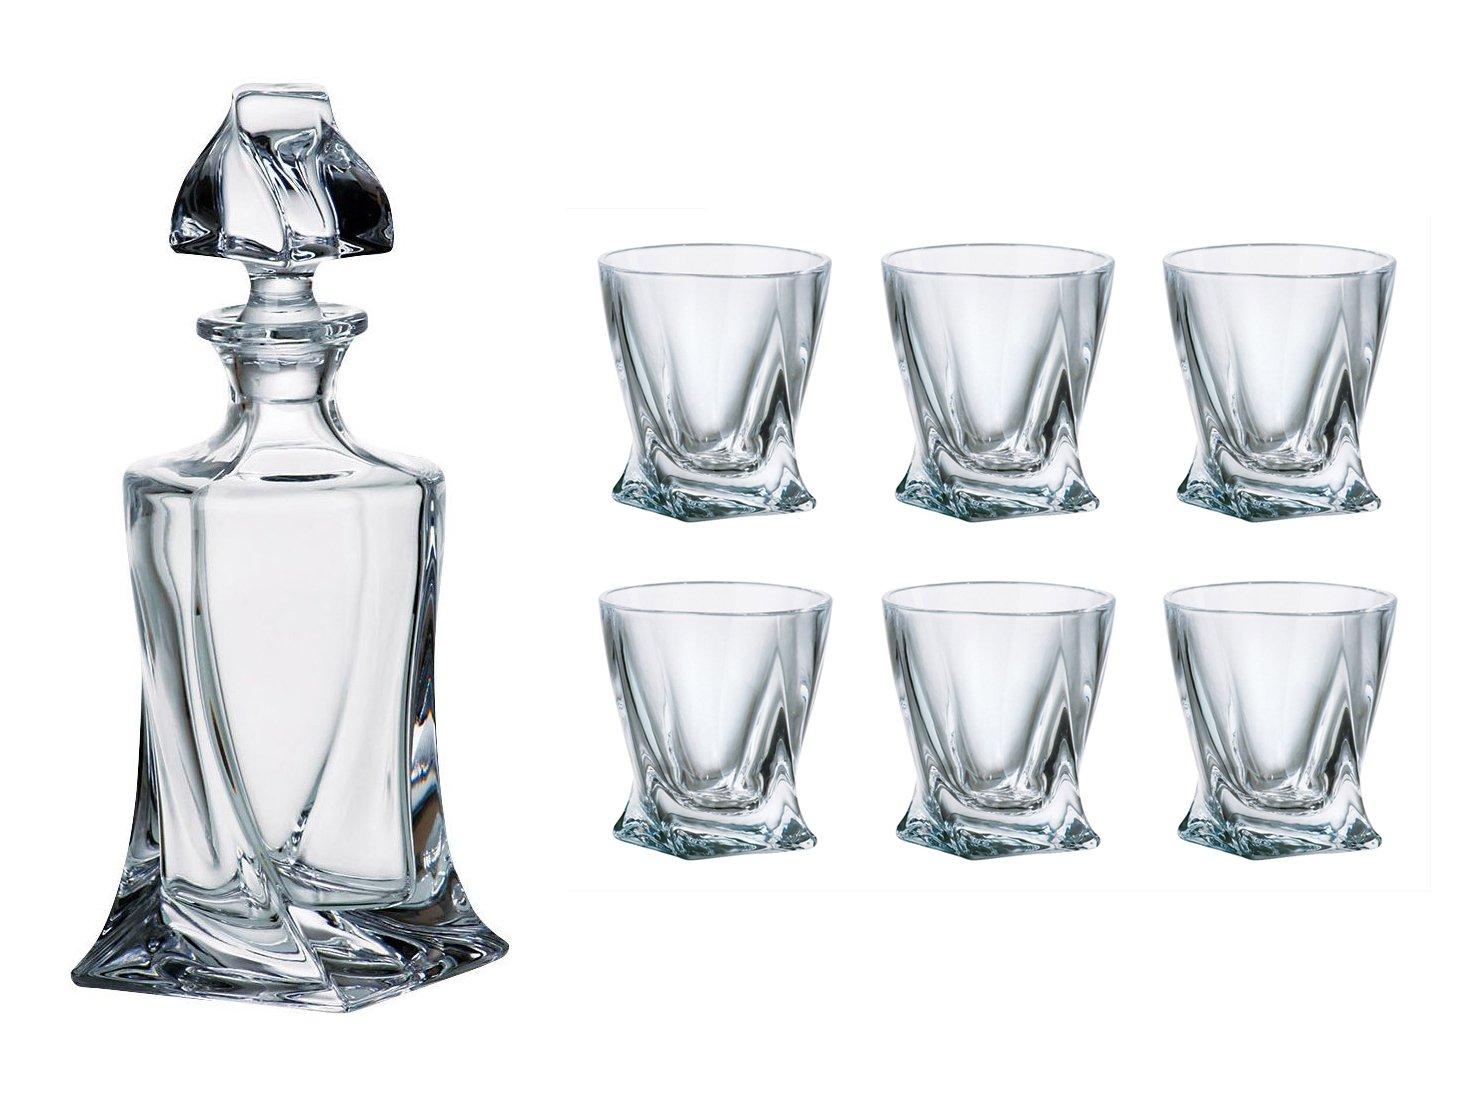 Crystalex Bohemia Quadro Liquor/Vodka Set, 1 Bohemian Crystal Glass 17-Ounce Decanter with Stopper and 6 Shot Glasses